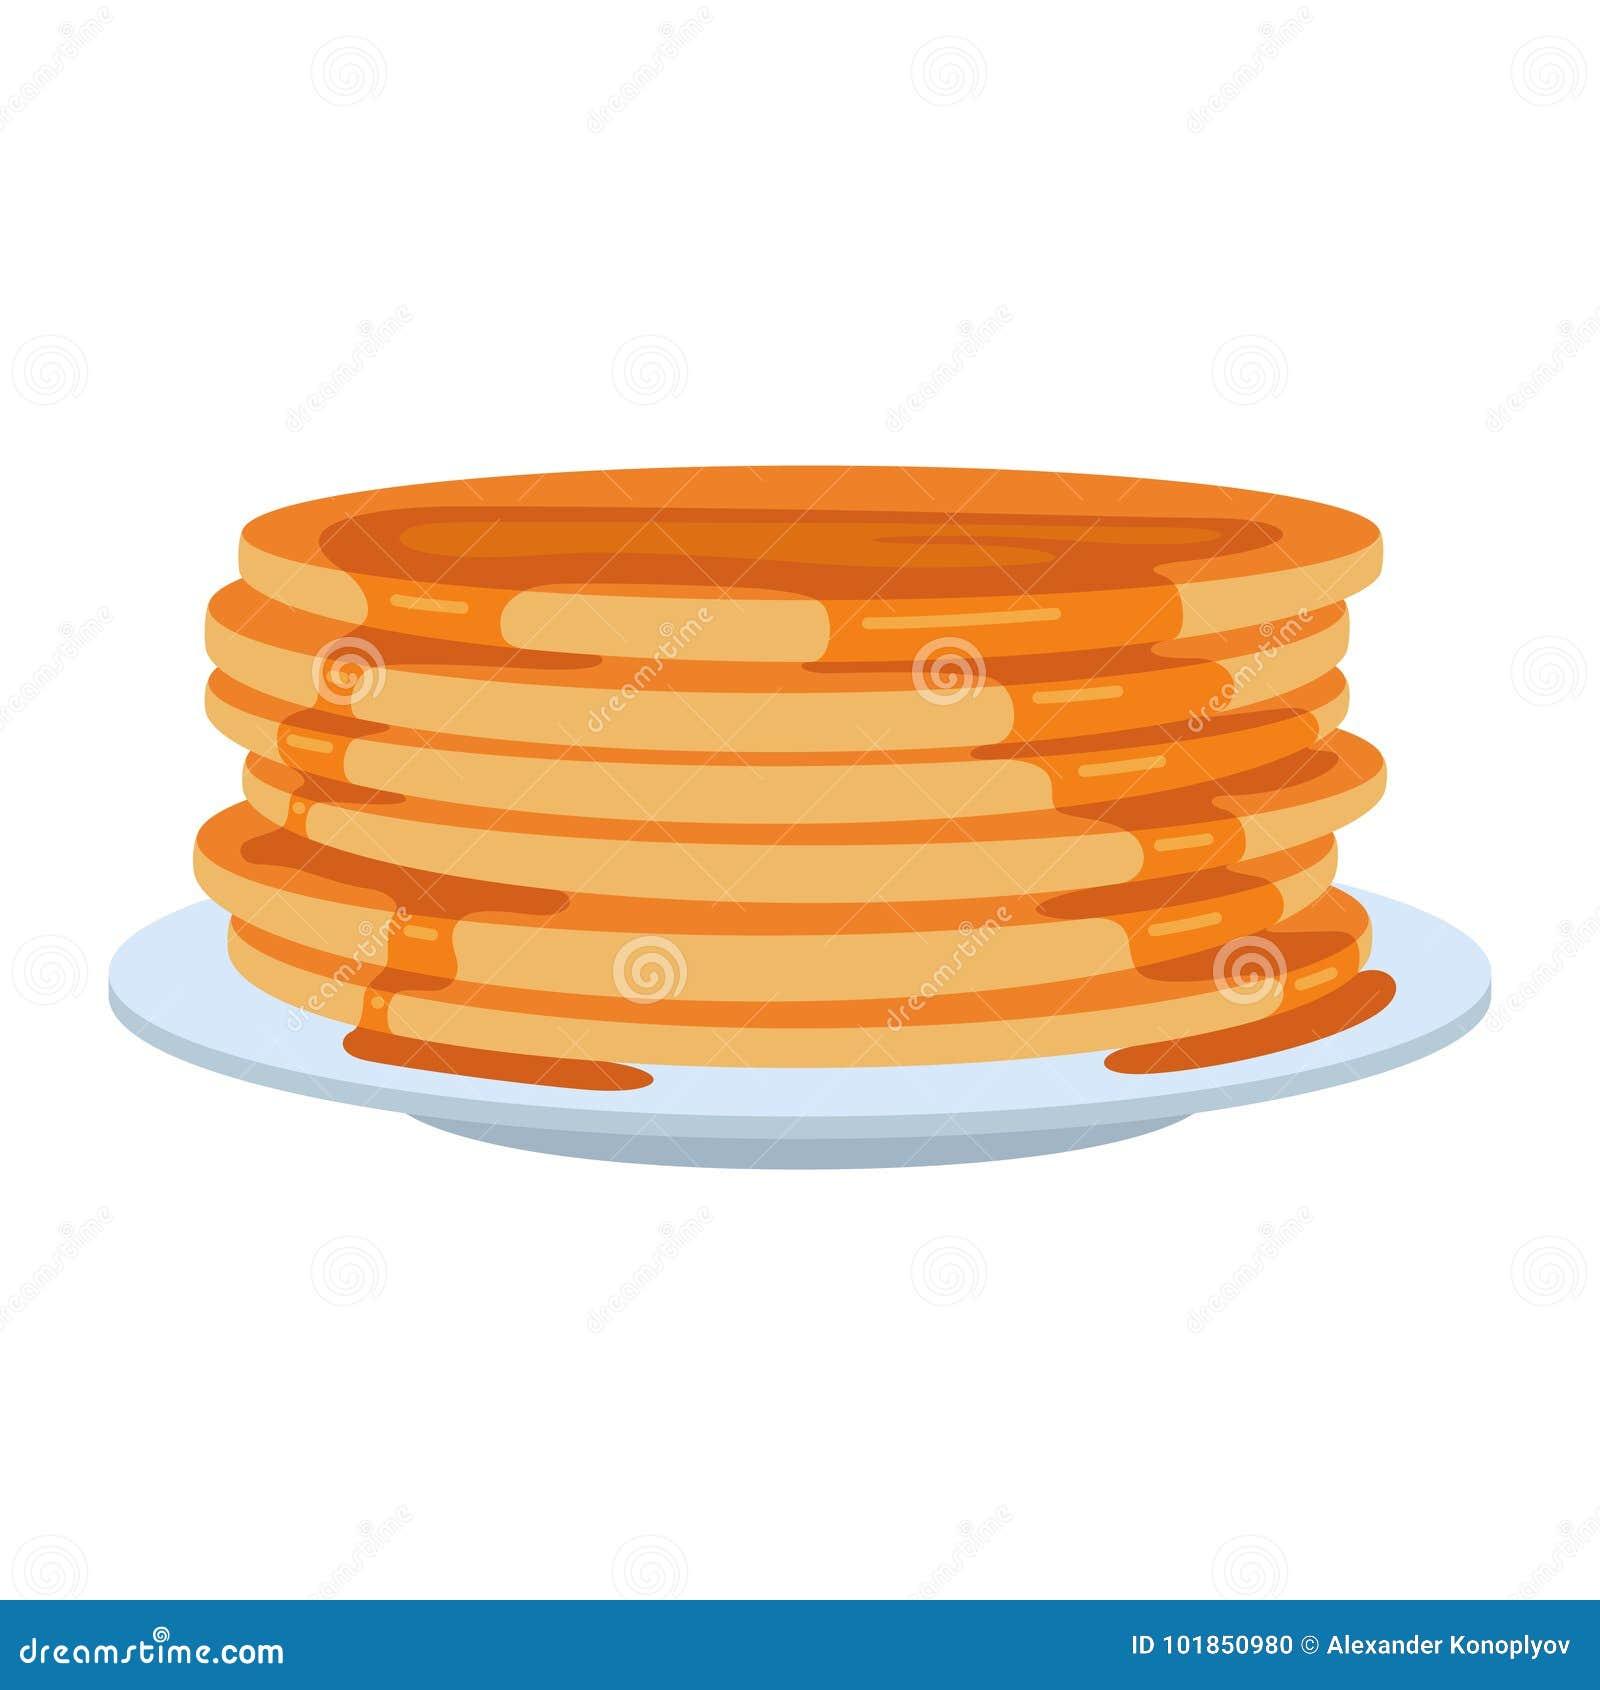 Pancakes on plate